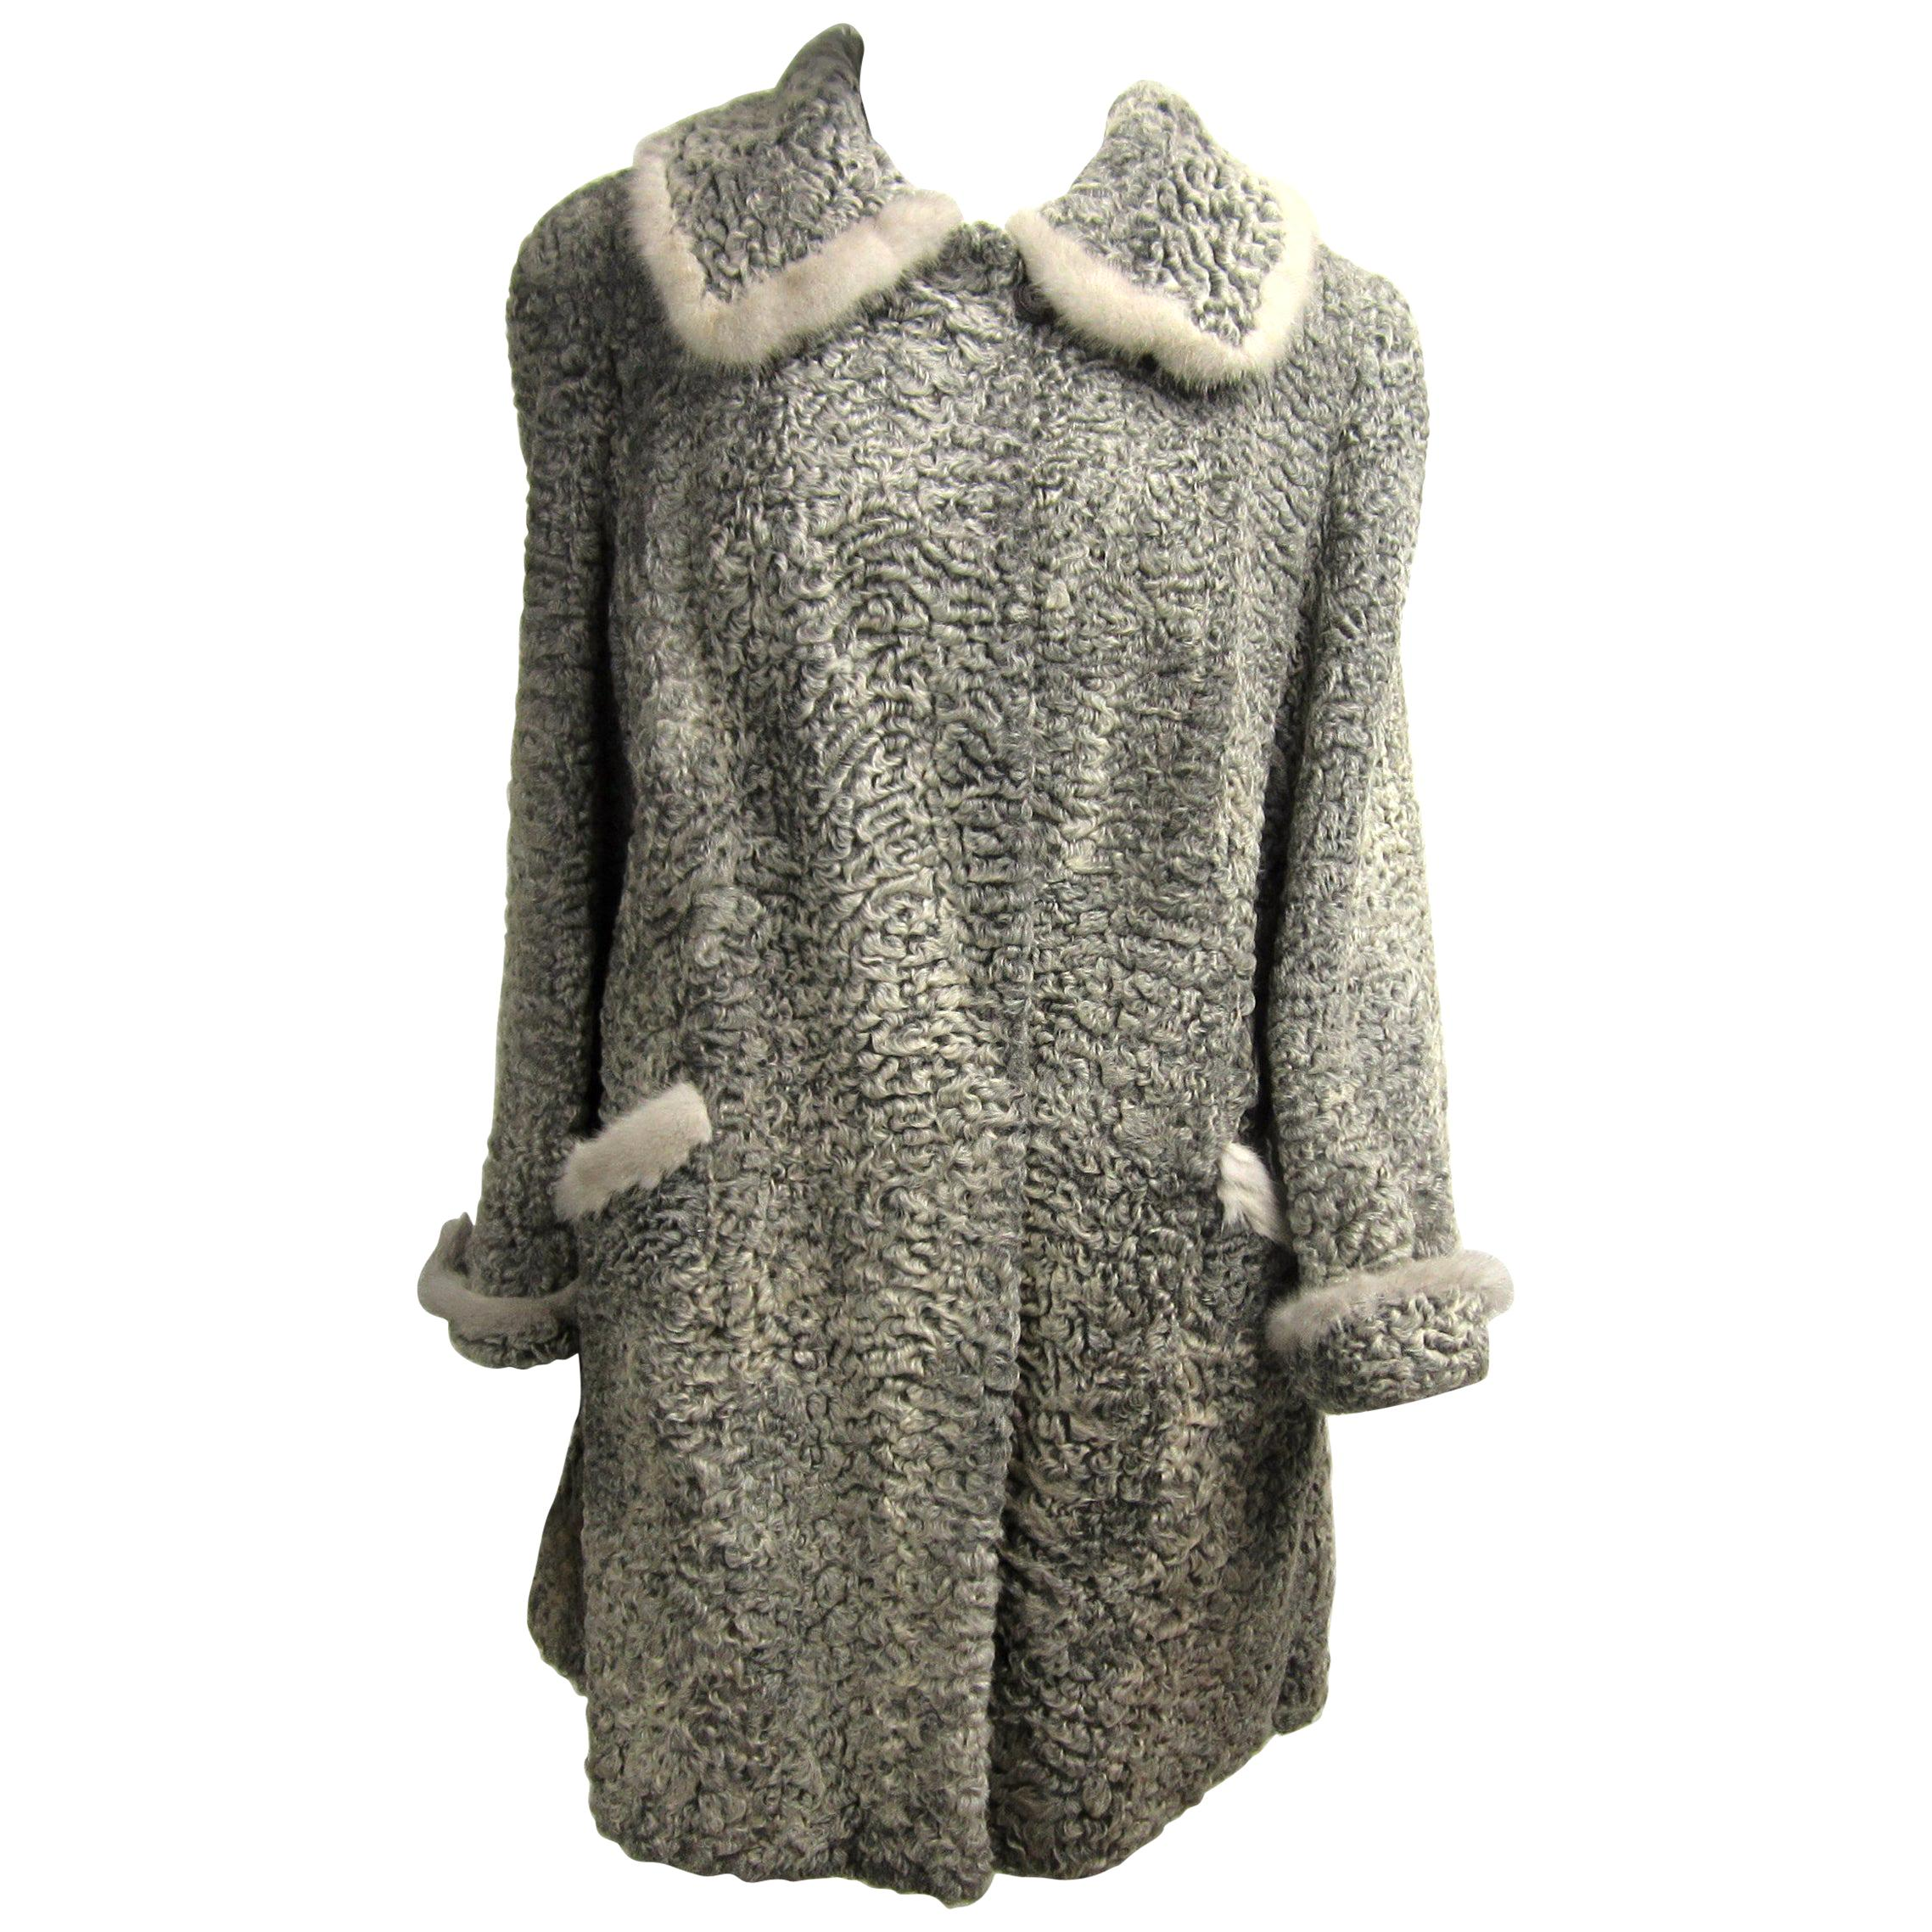 Vintage Persian Lamb Astrakhan - Mink fur Car coat Jacket Grey Large